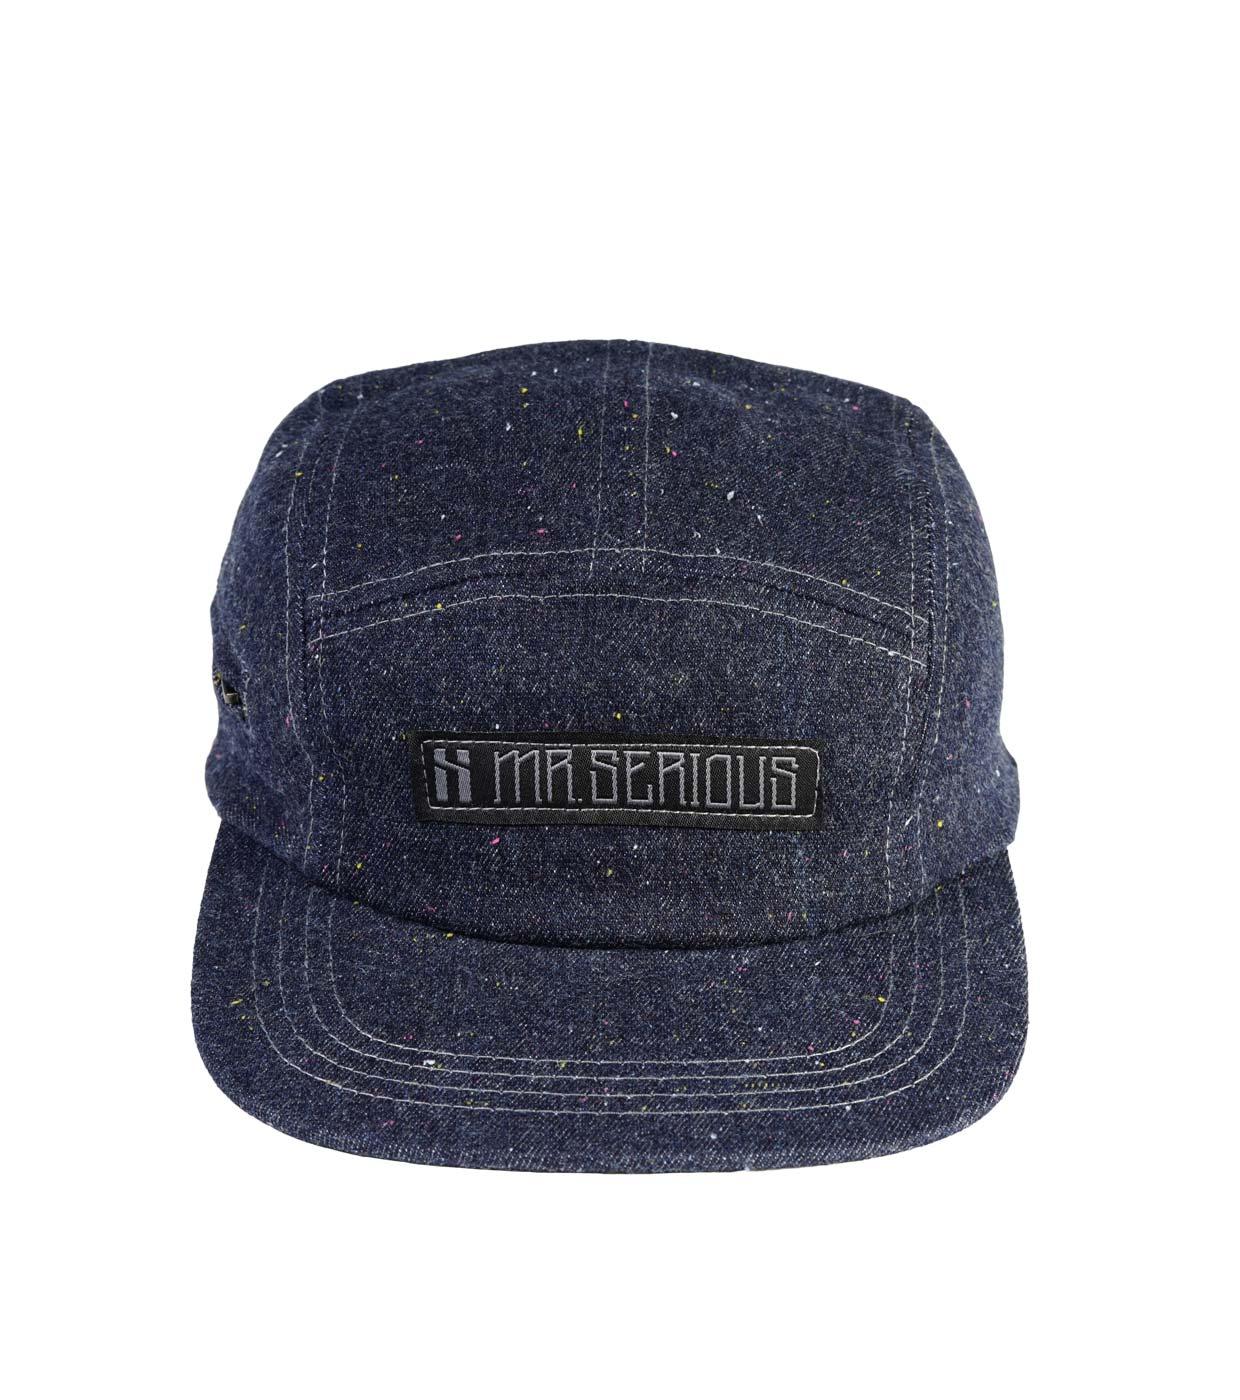 da91d68f8c9f78 Mr Serious Zip Cap - 5 panel snapback cap made of blue denim, pocket ...